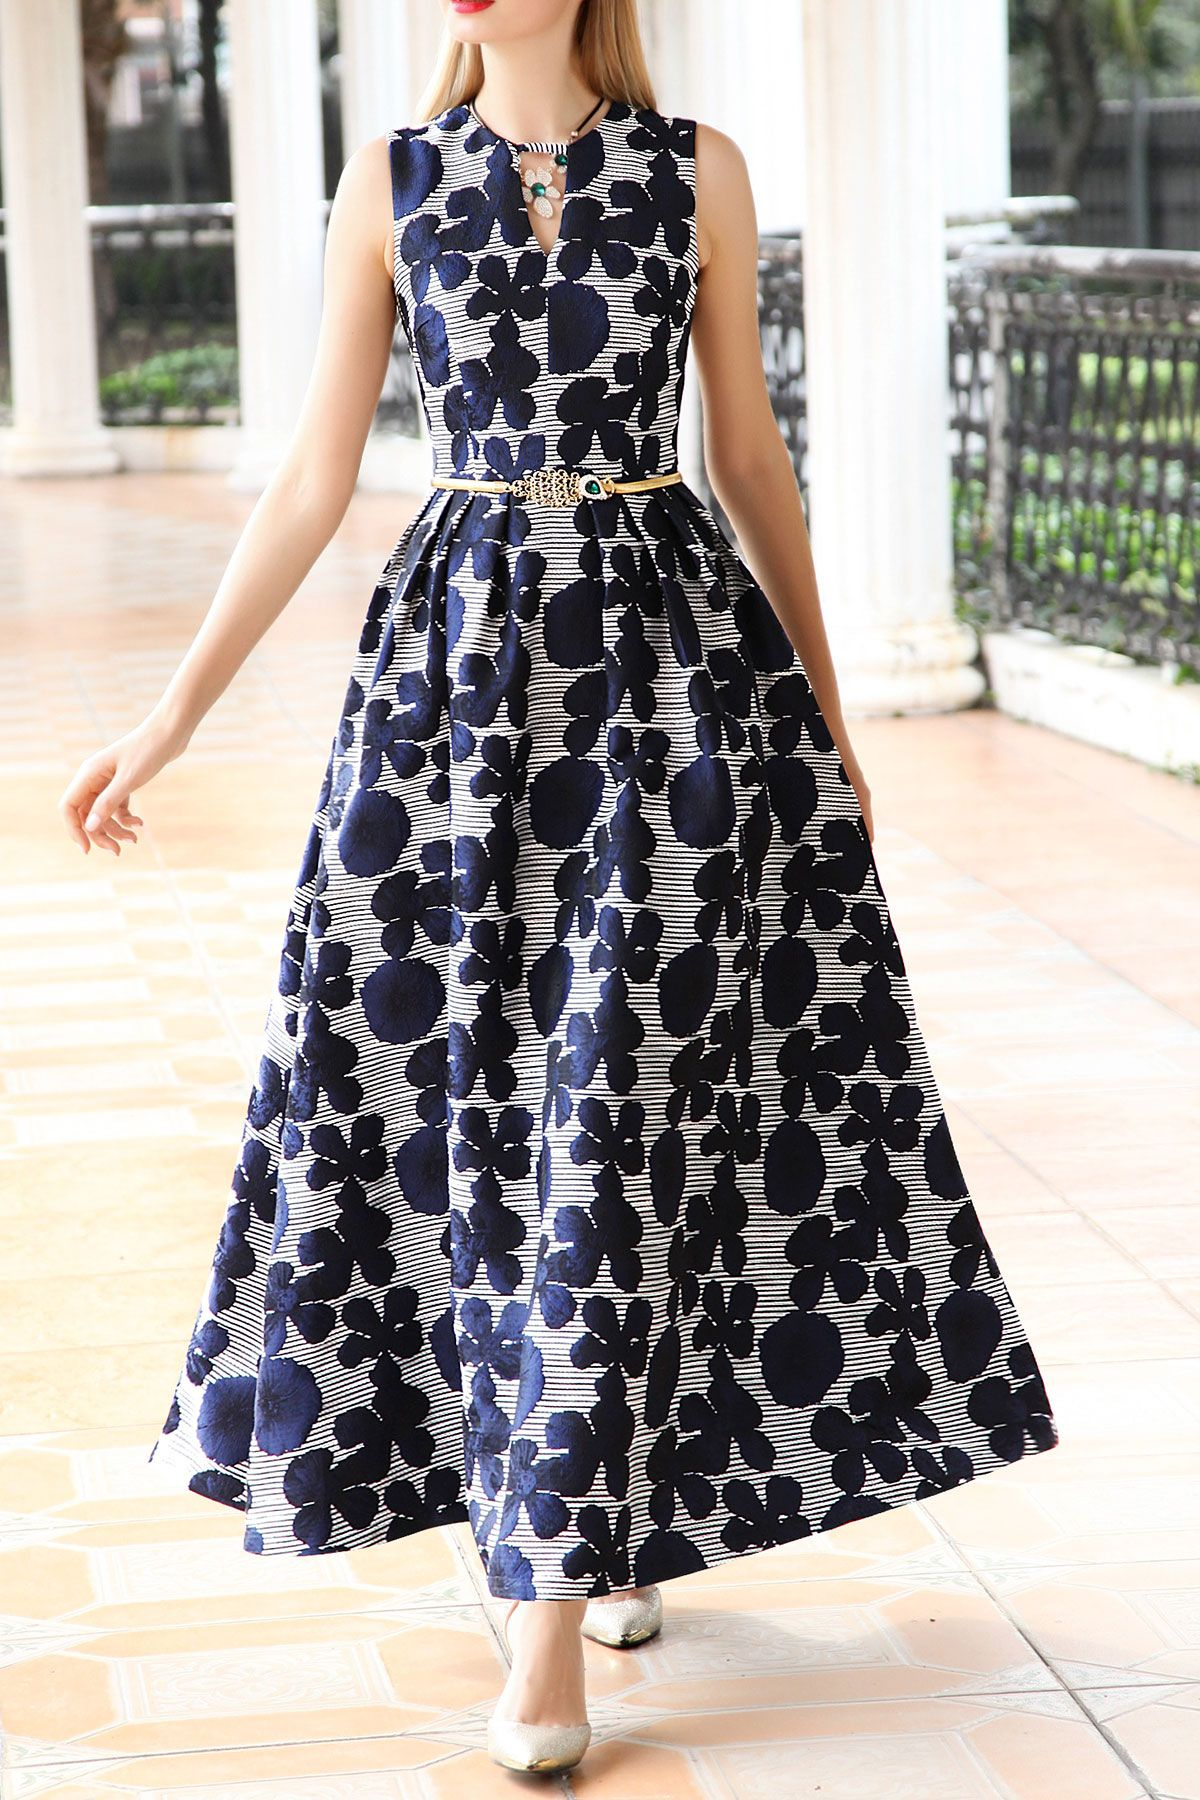 Floral maxi dress floral maxi dress floral maxi and maxi dresses